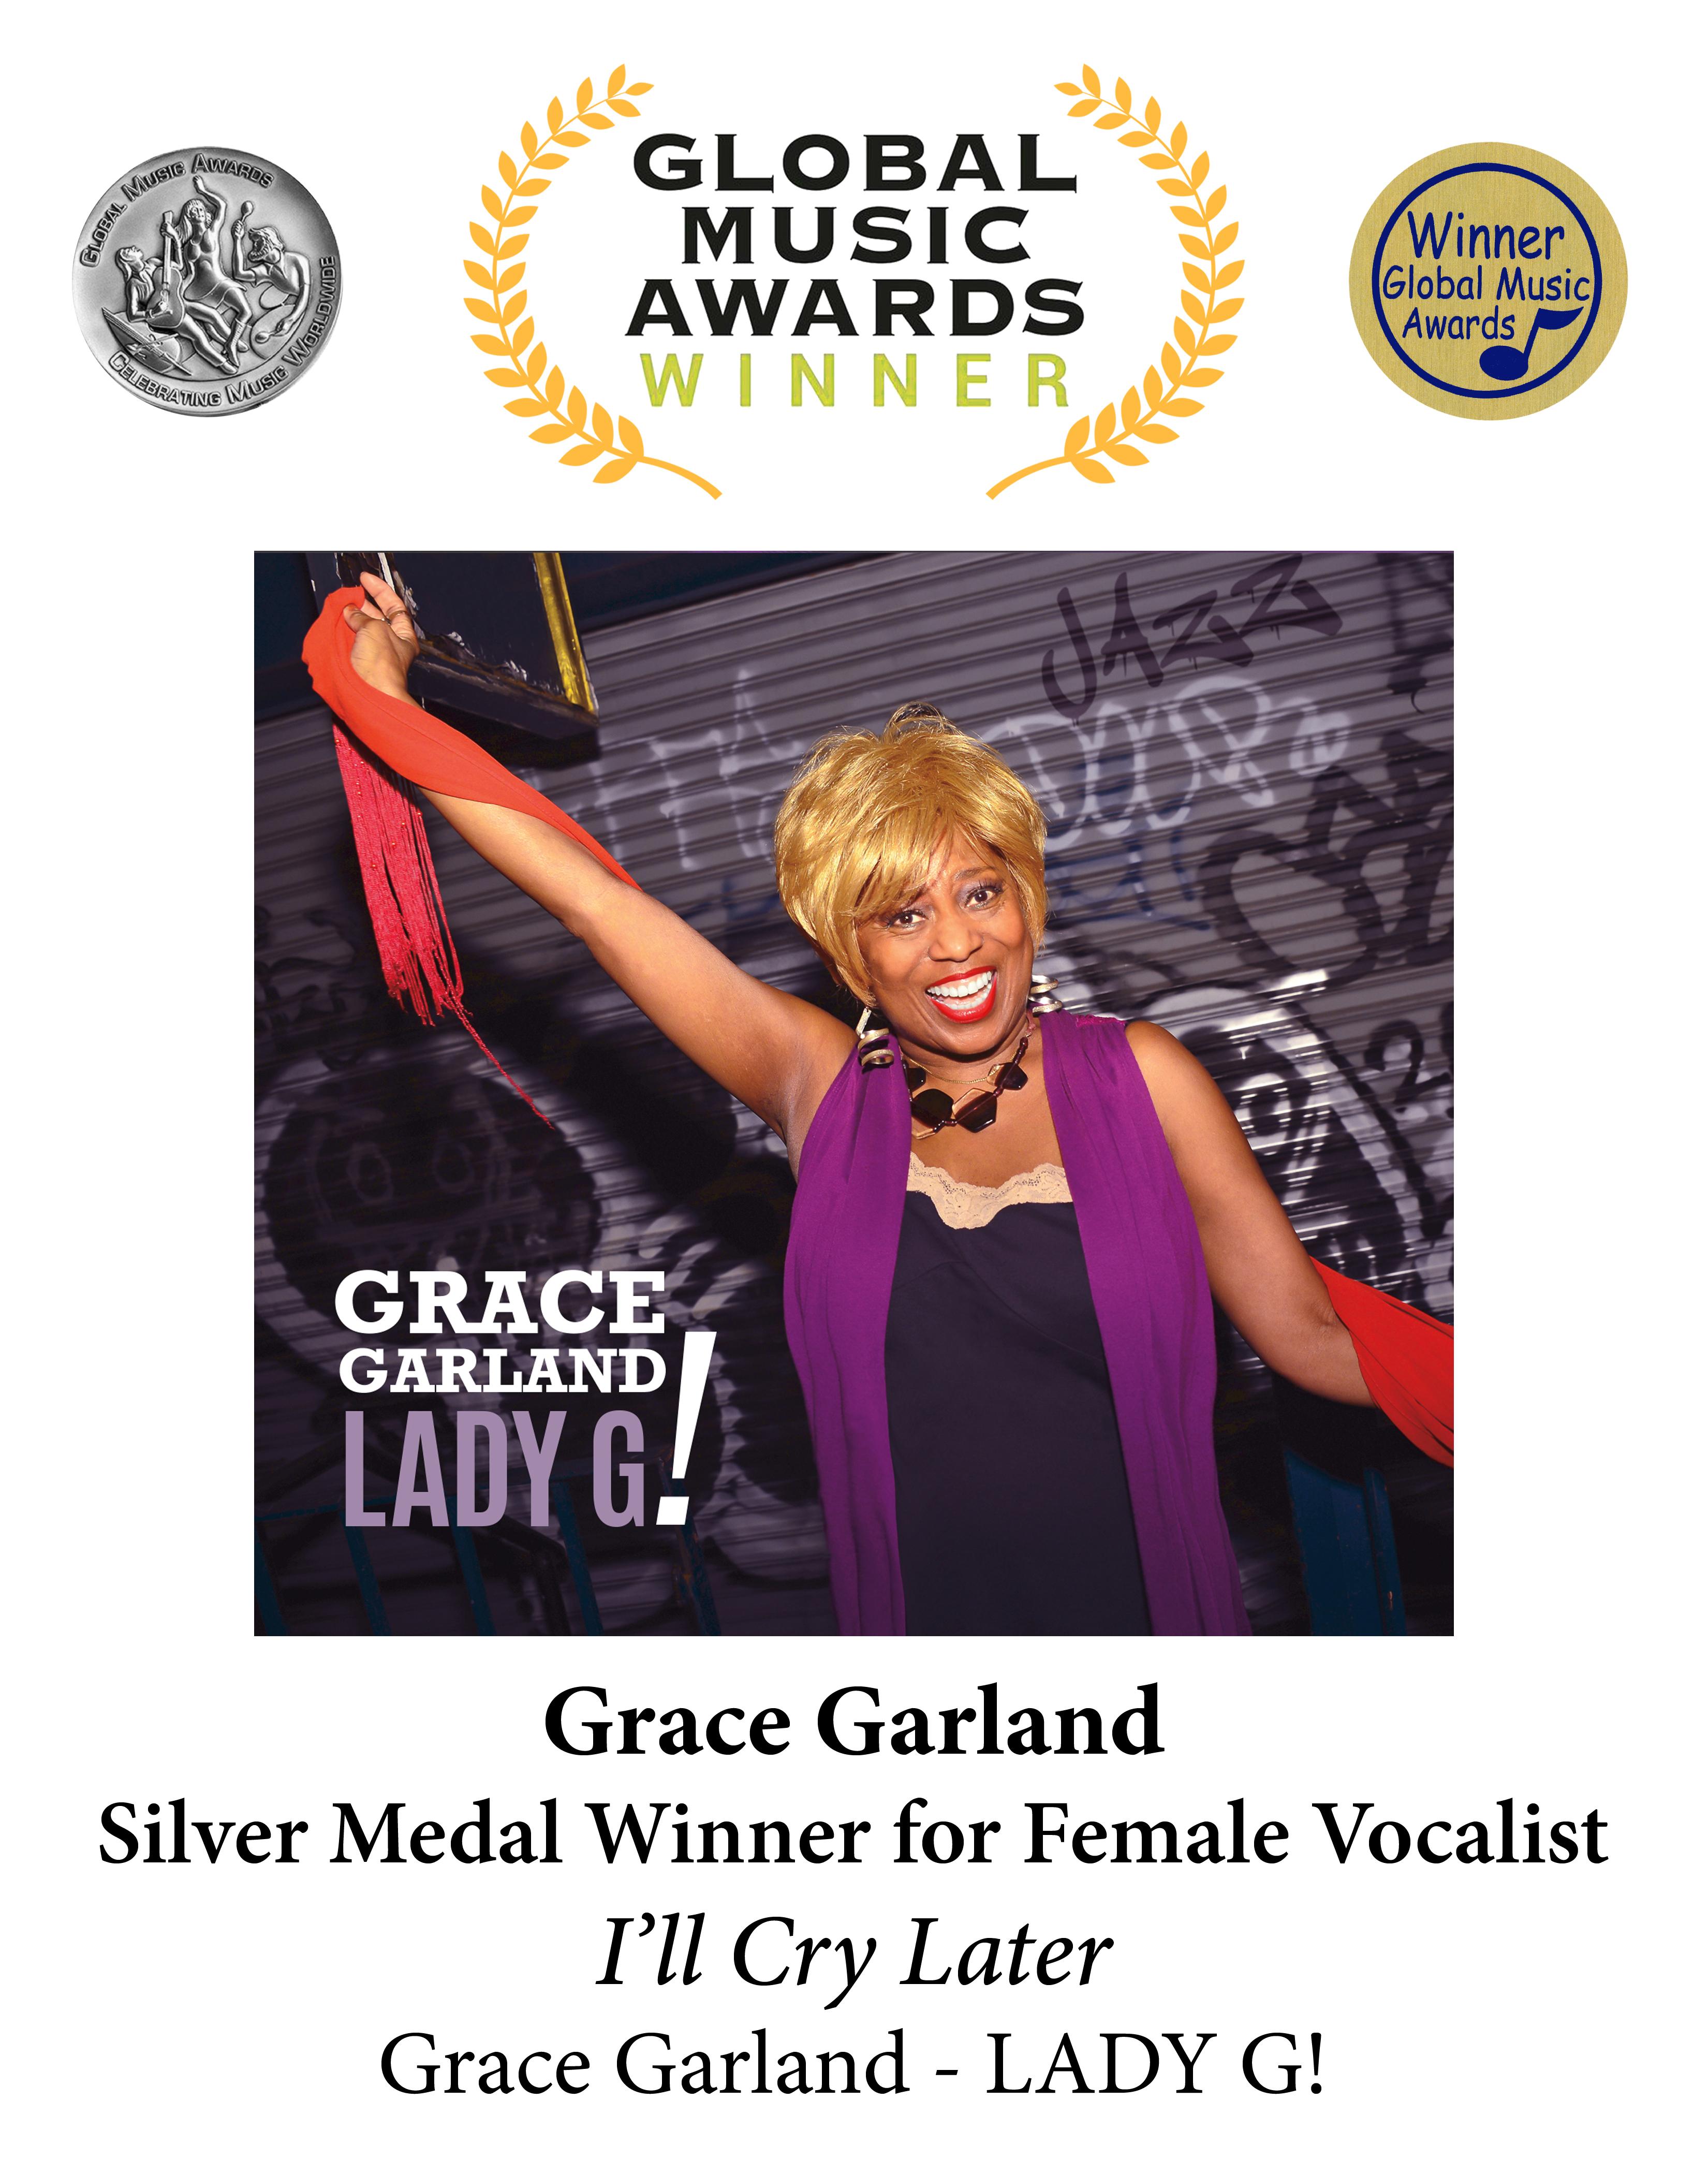 #AwardWinner Grace Garland!:)